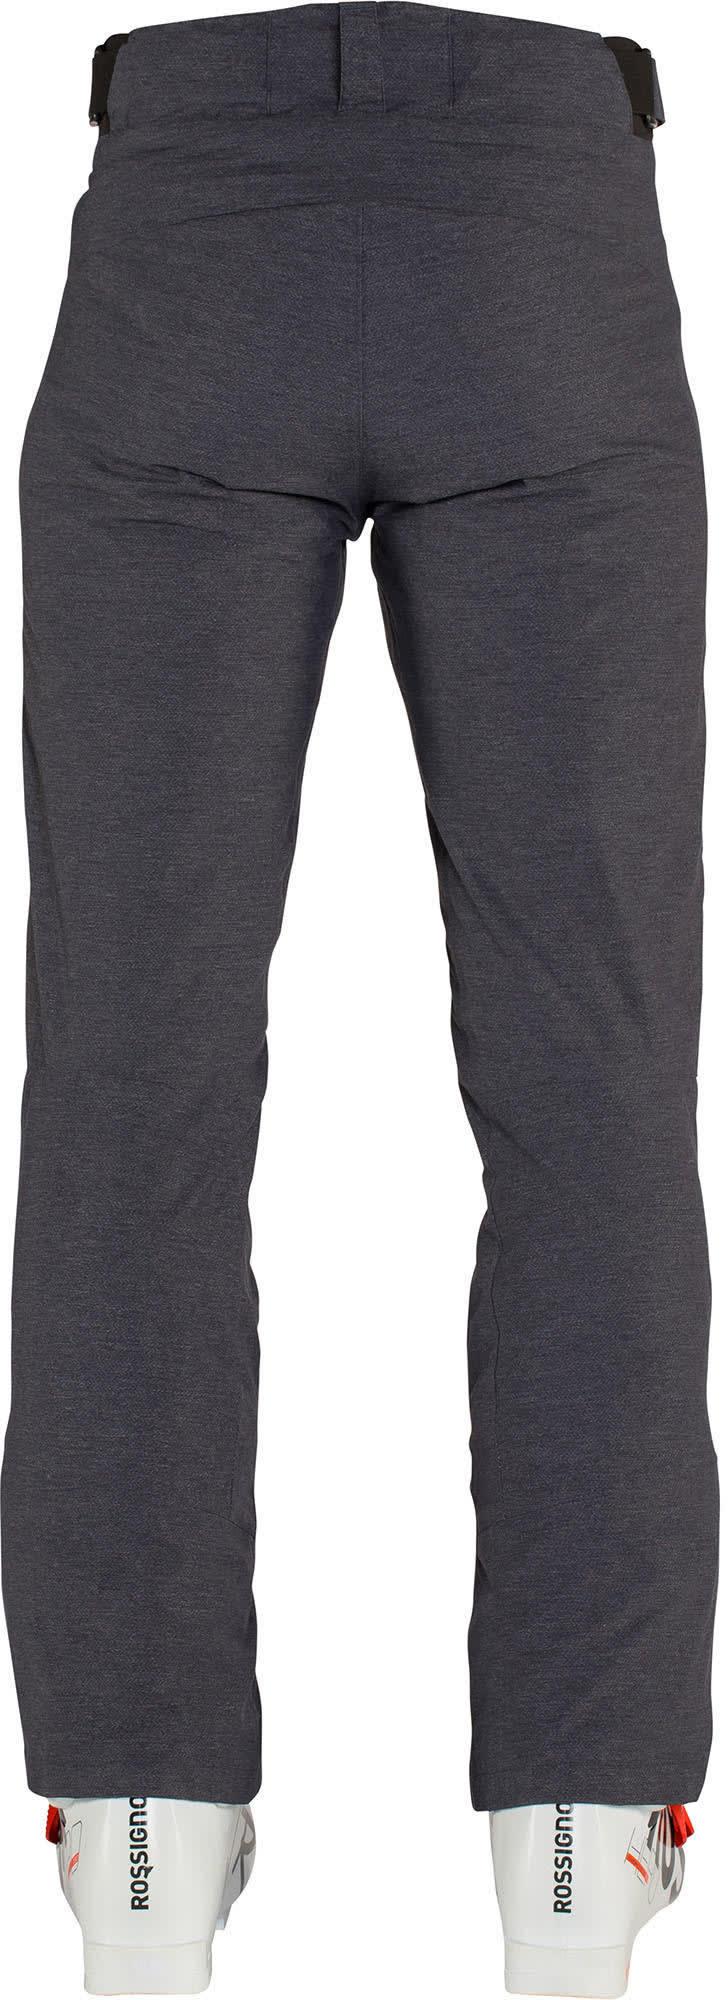 542570dbc3 Rossignol Oxford Ski Pants - thumbnail 2